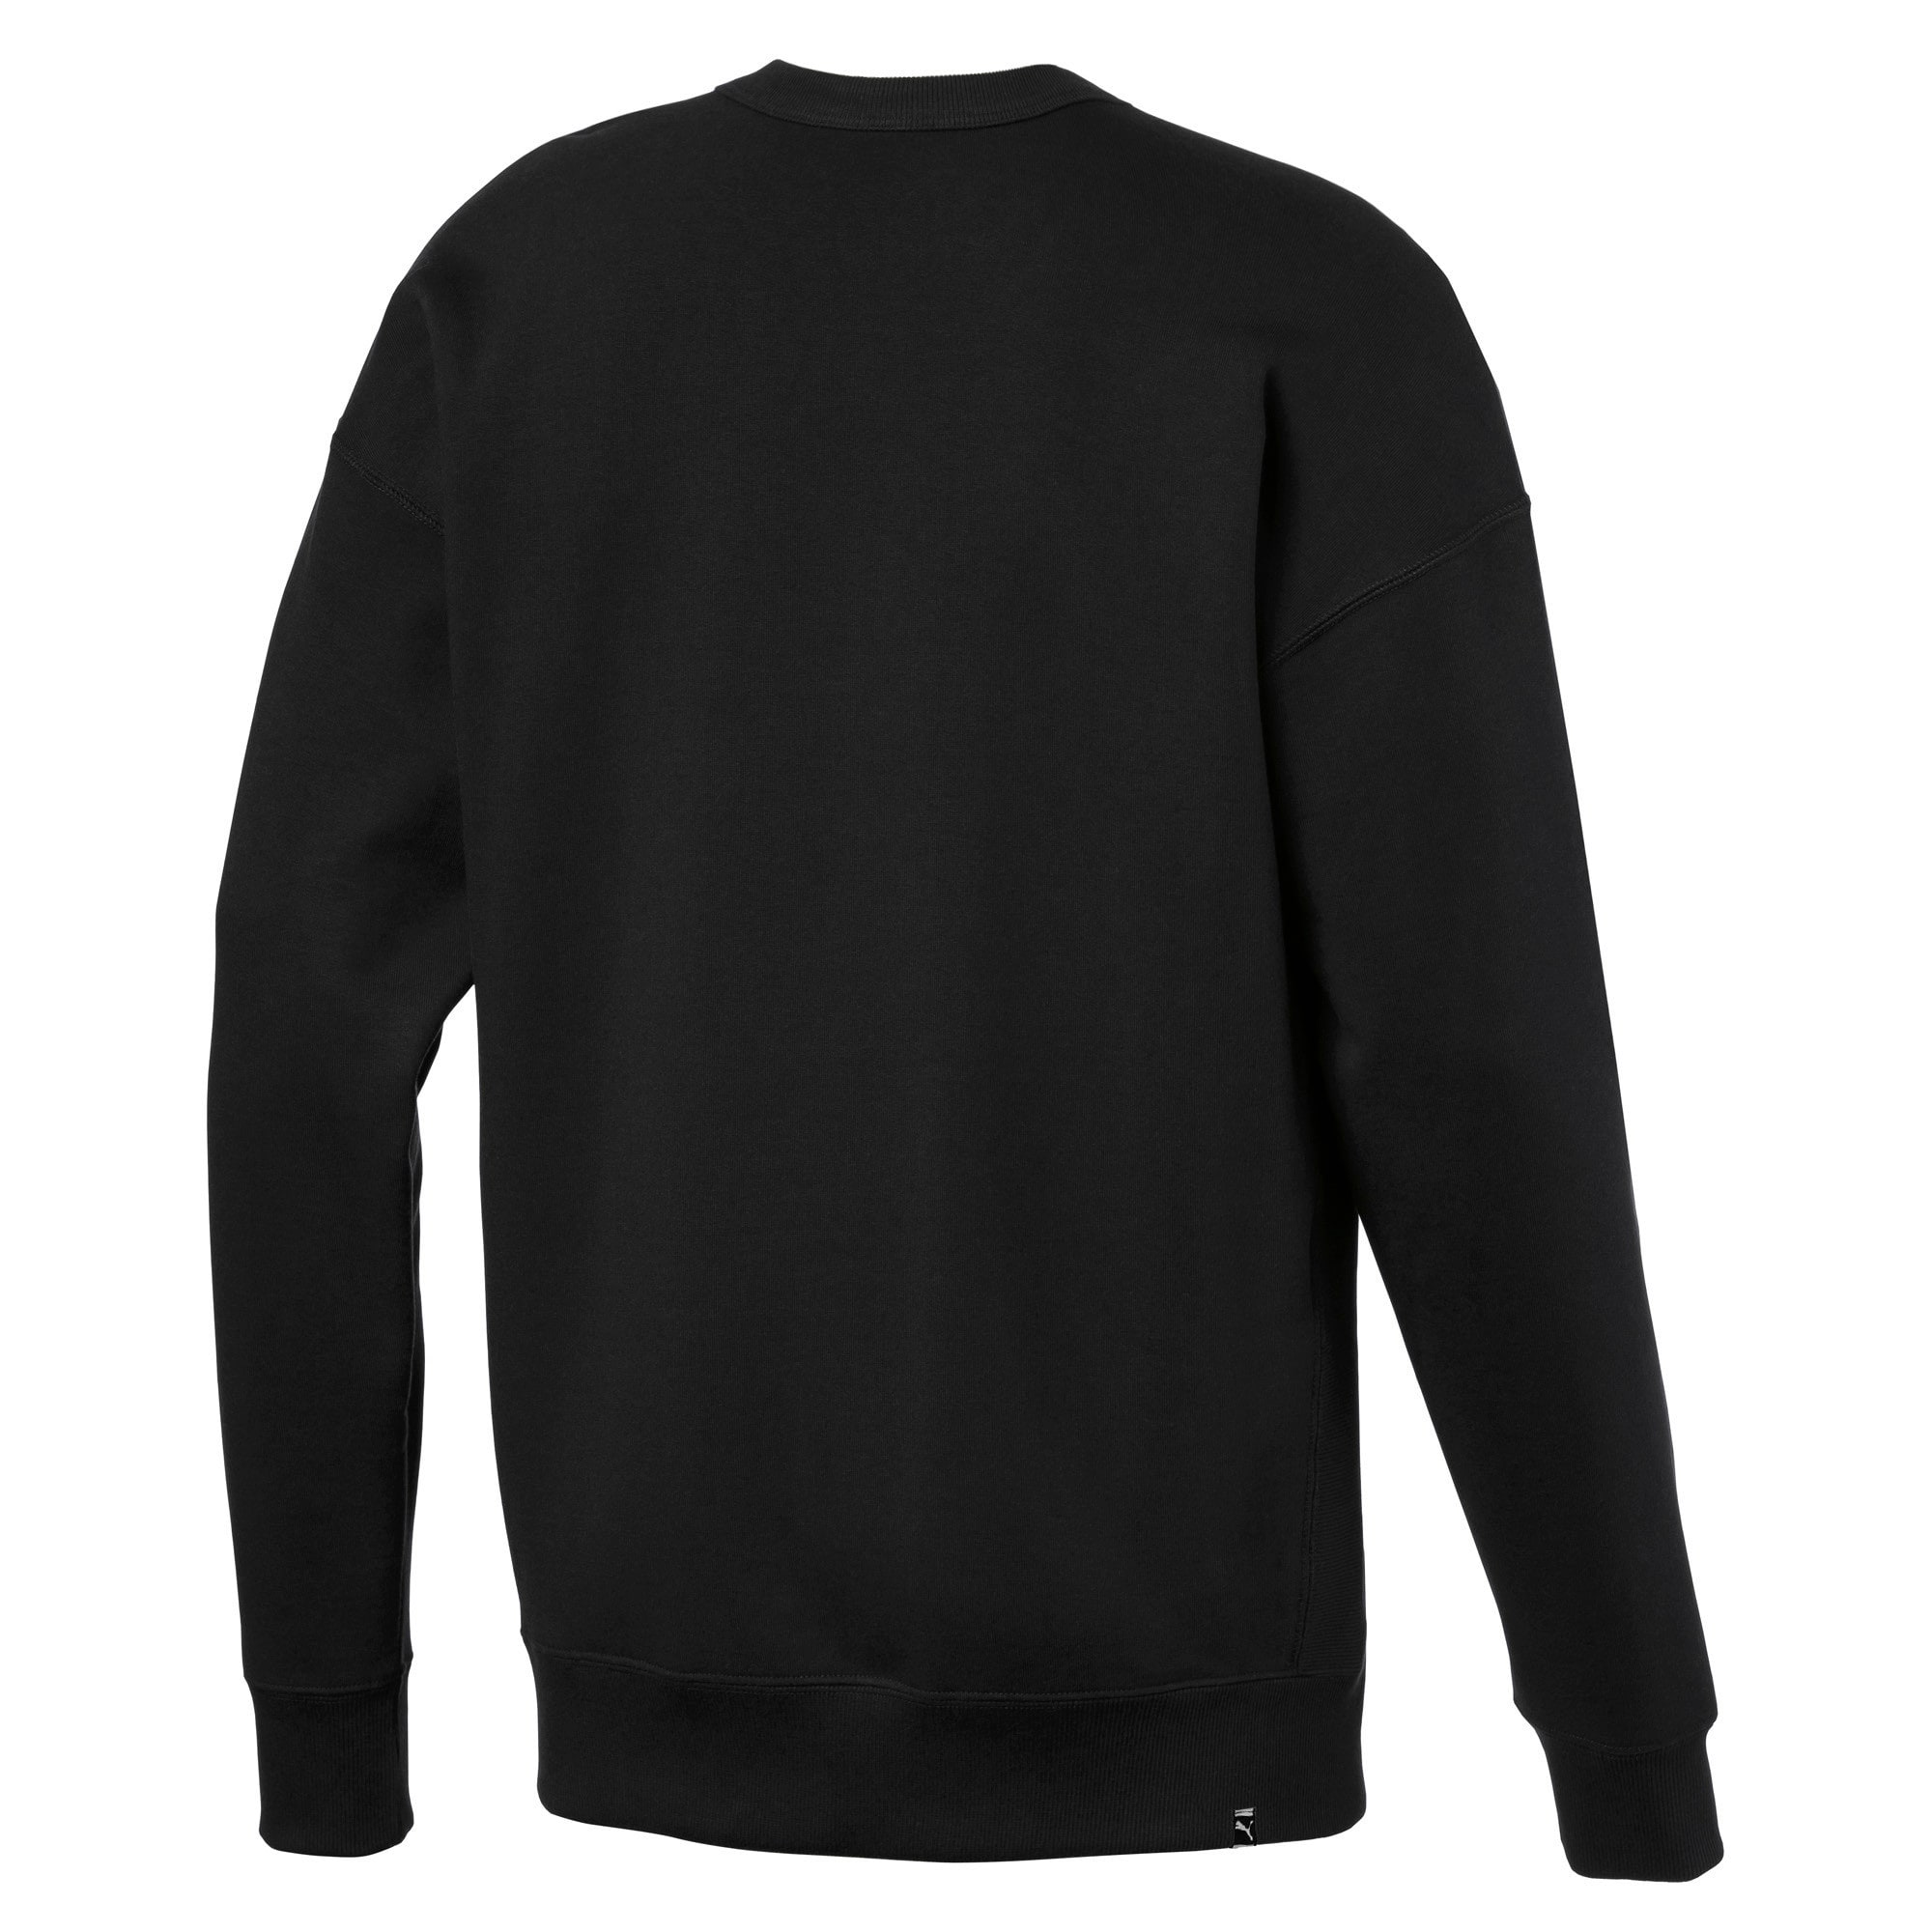 Thumbnail 5 of Downtown Men's Crewneck Sweatshirt, Puma Black, medium